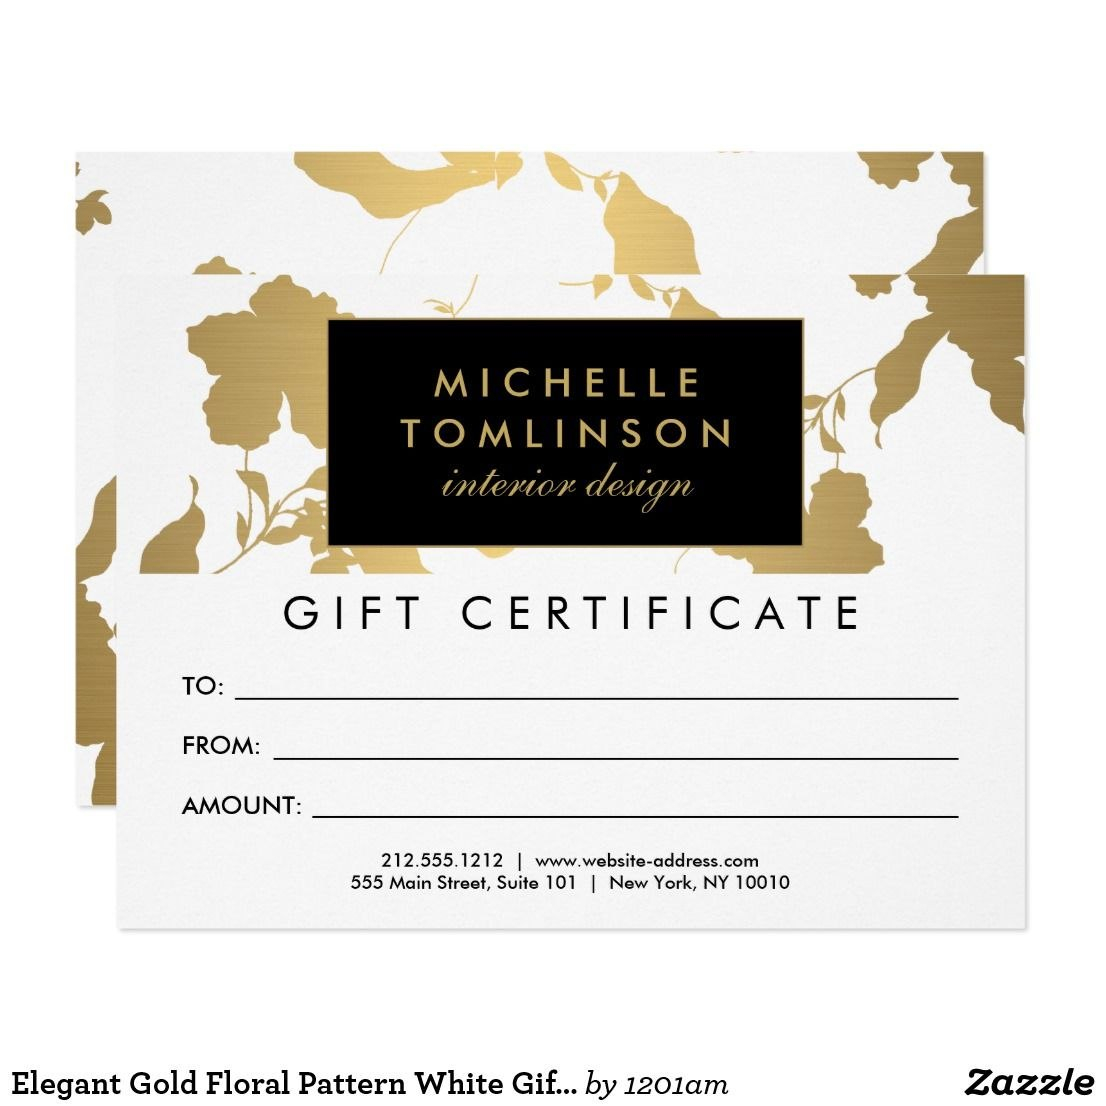 Elegant Gold Floral Pattern White Gift Certificate  Zazzleca In With Elegant Gift Certificate Template